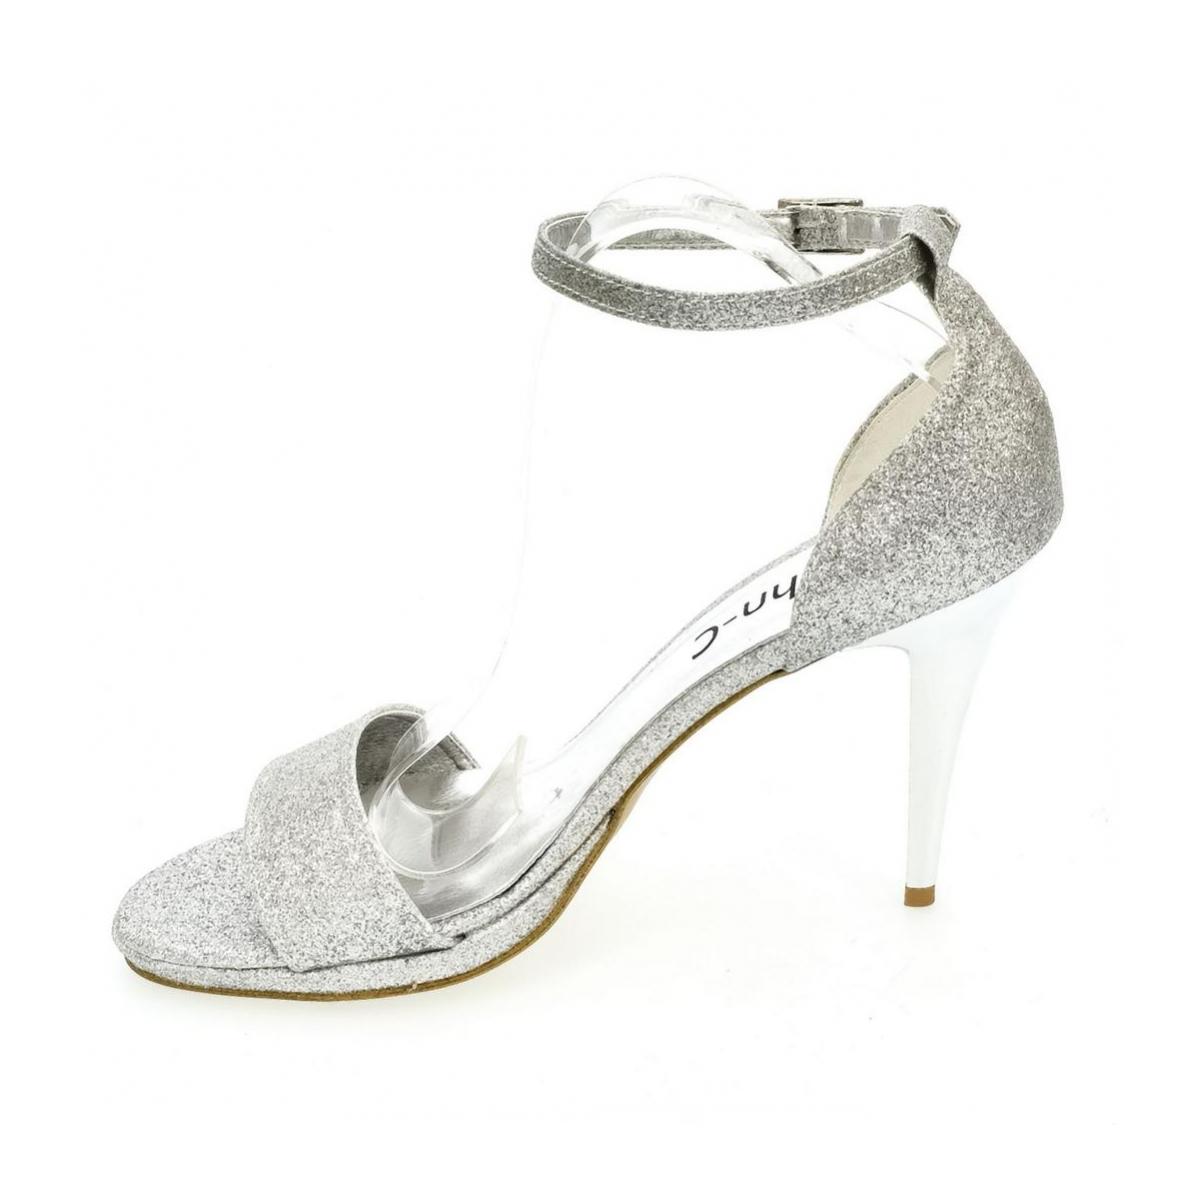 44b14836a62e1 Dámske strieborné sandále KAJA - 6